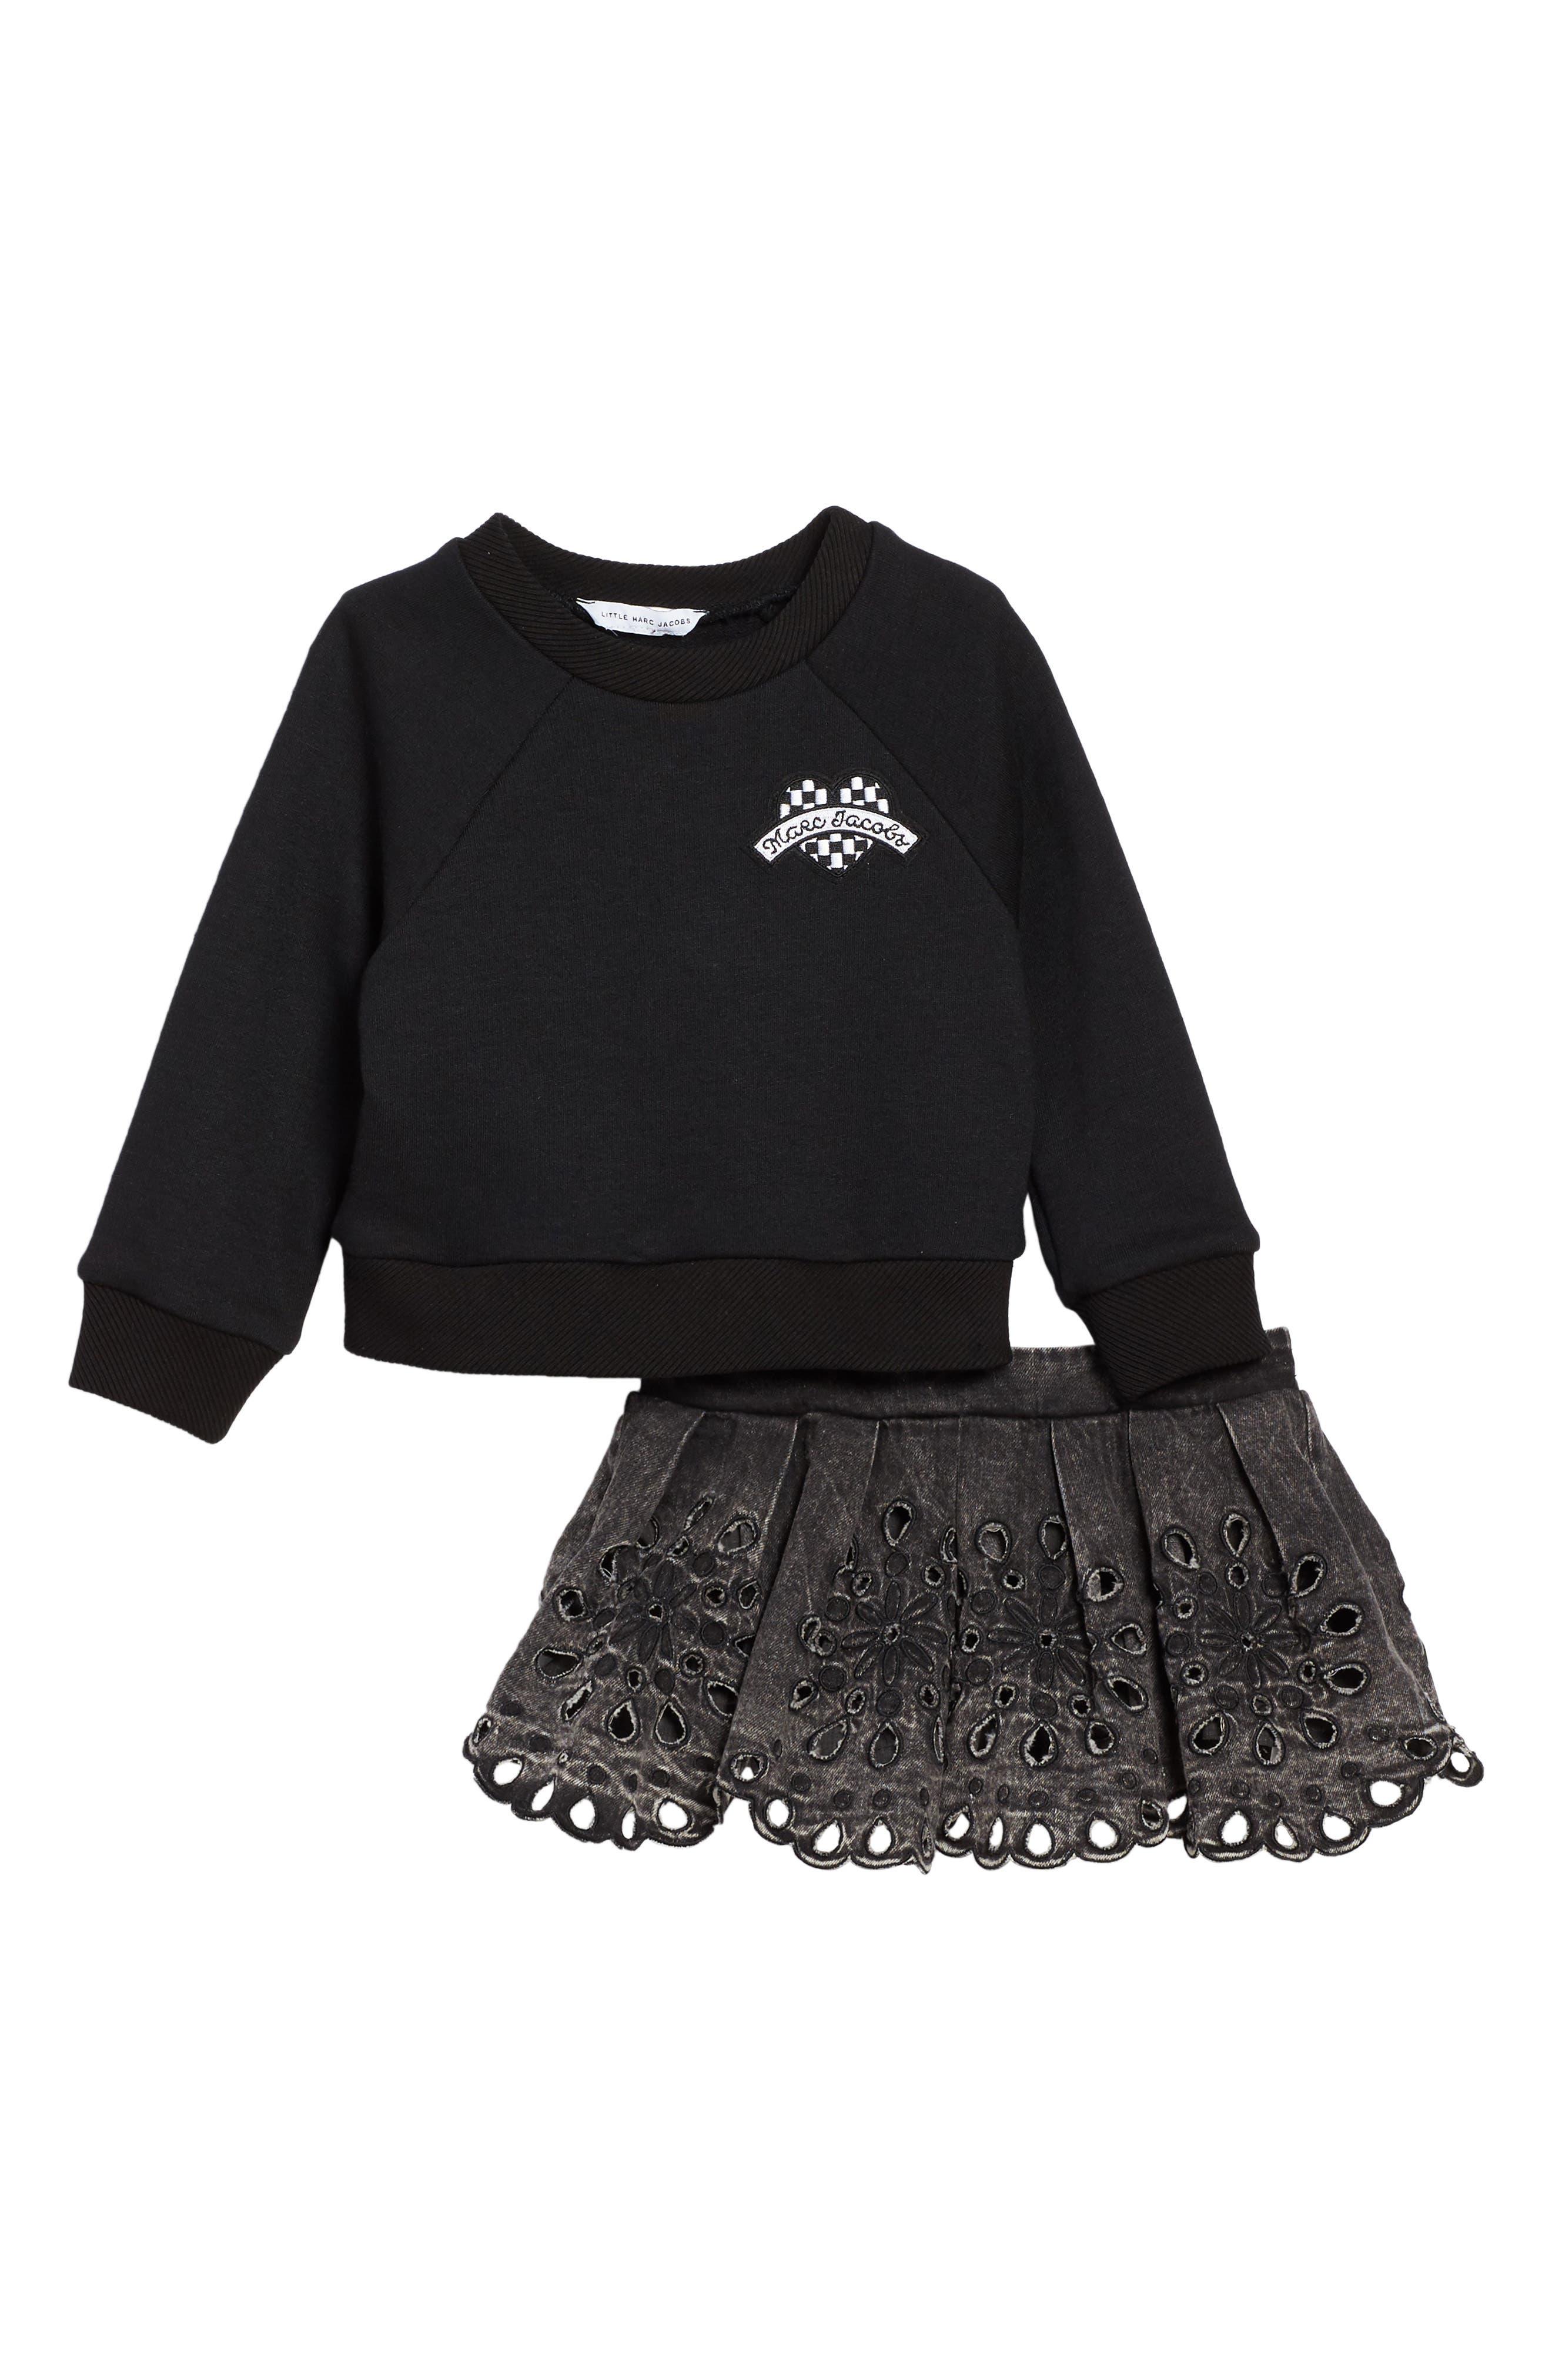 Main Image - LITTLE MARC JACOBS Sweatshirt & Skirt Set (Toddler Girls, Little Girls & Big Girls)